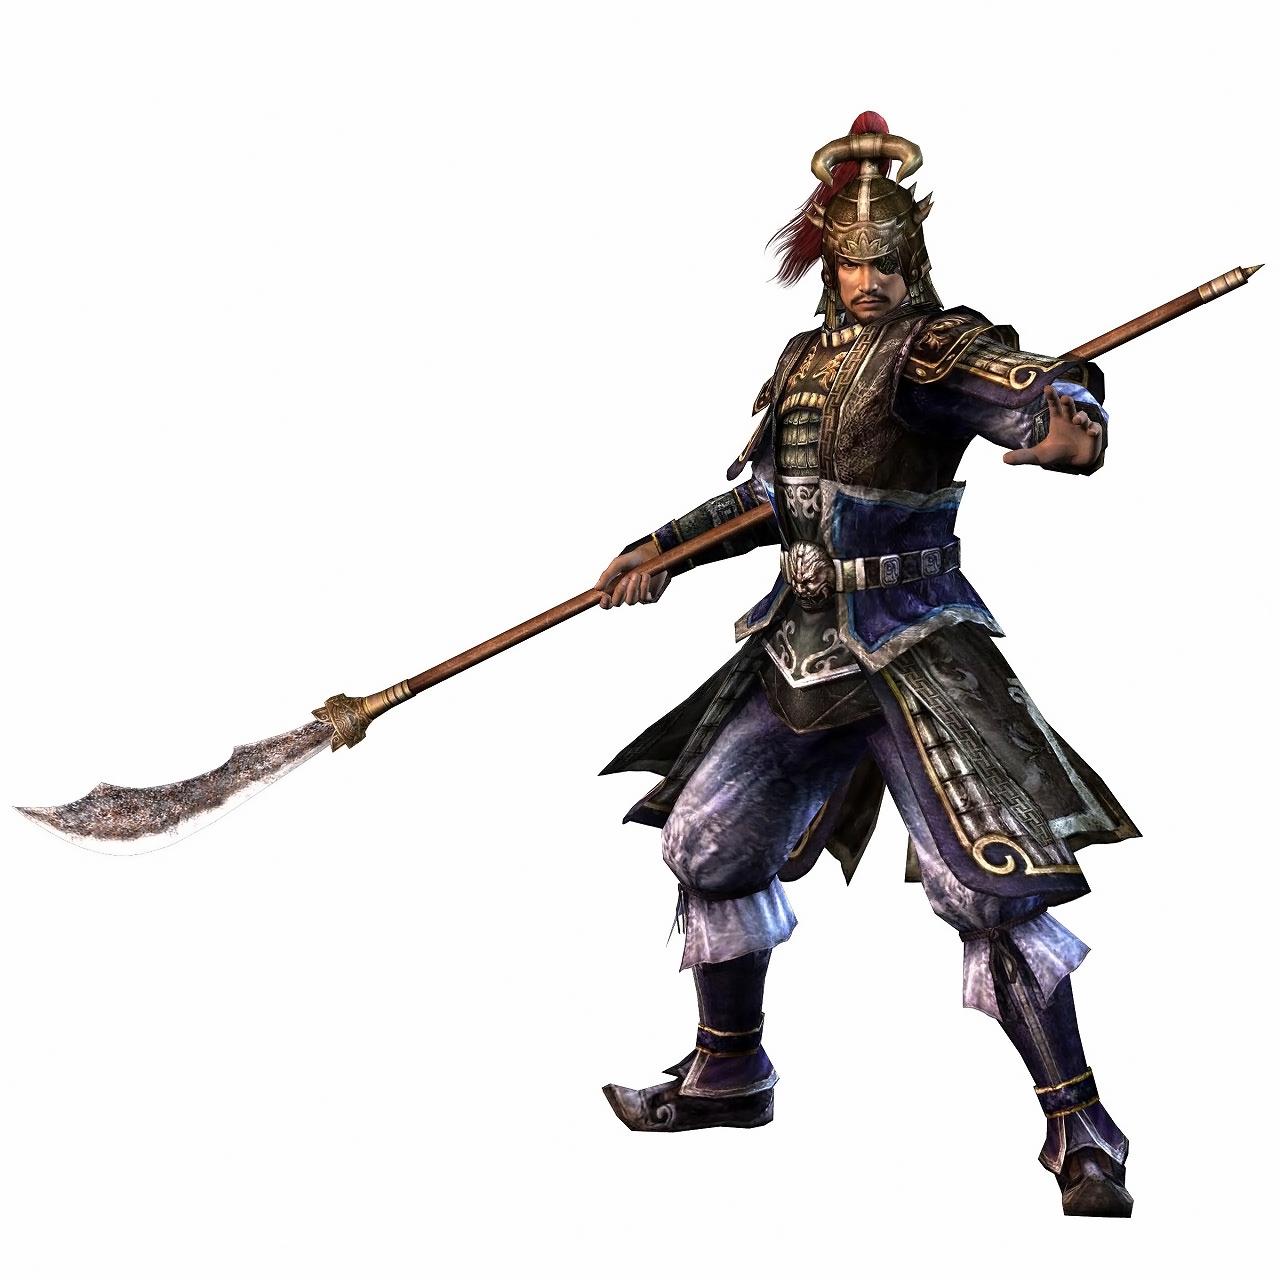 Guide Trophée Warriors Legends Of Troy: Image - Xiahoudun-rotkonline.jpg